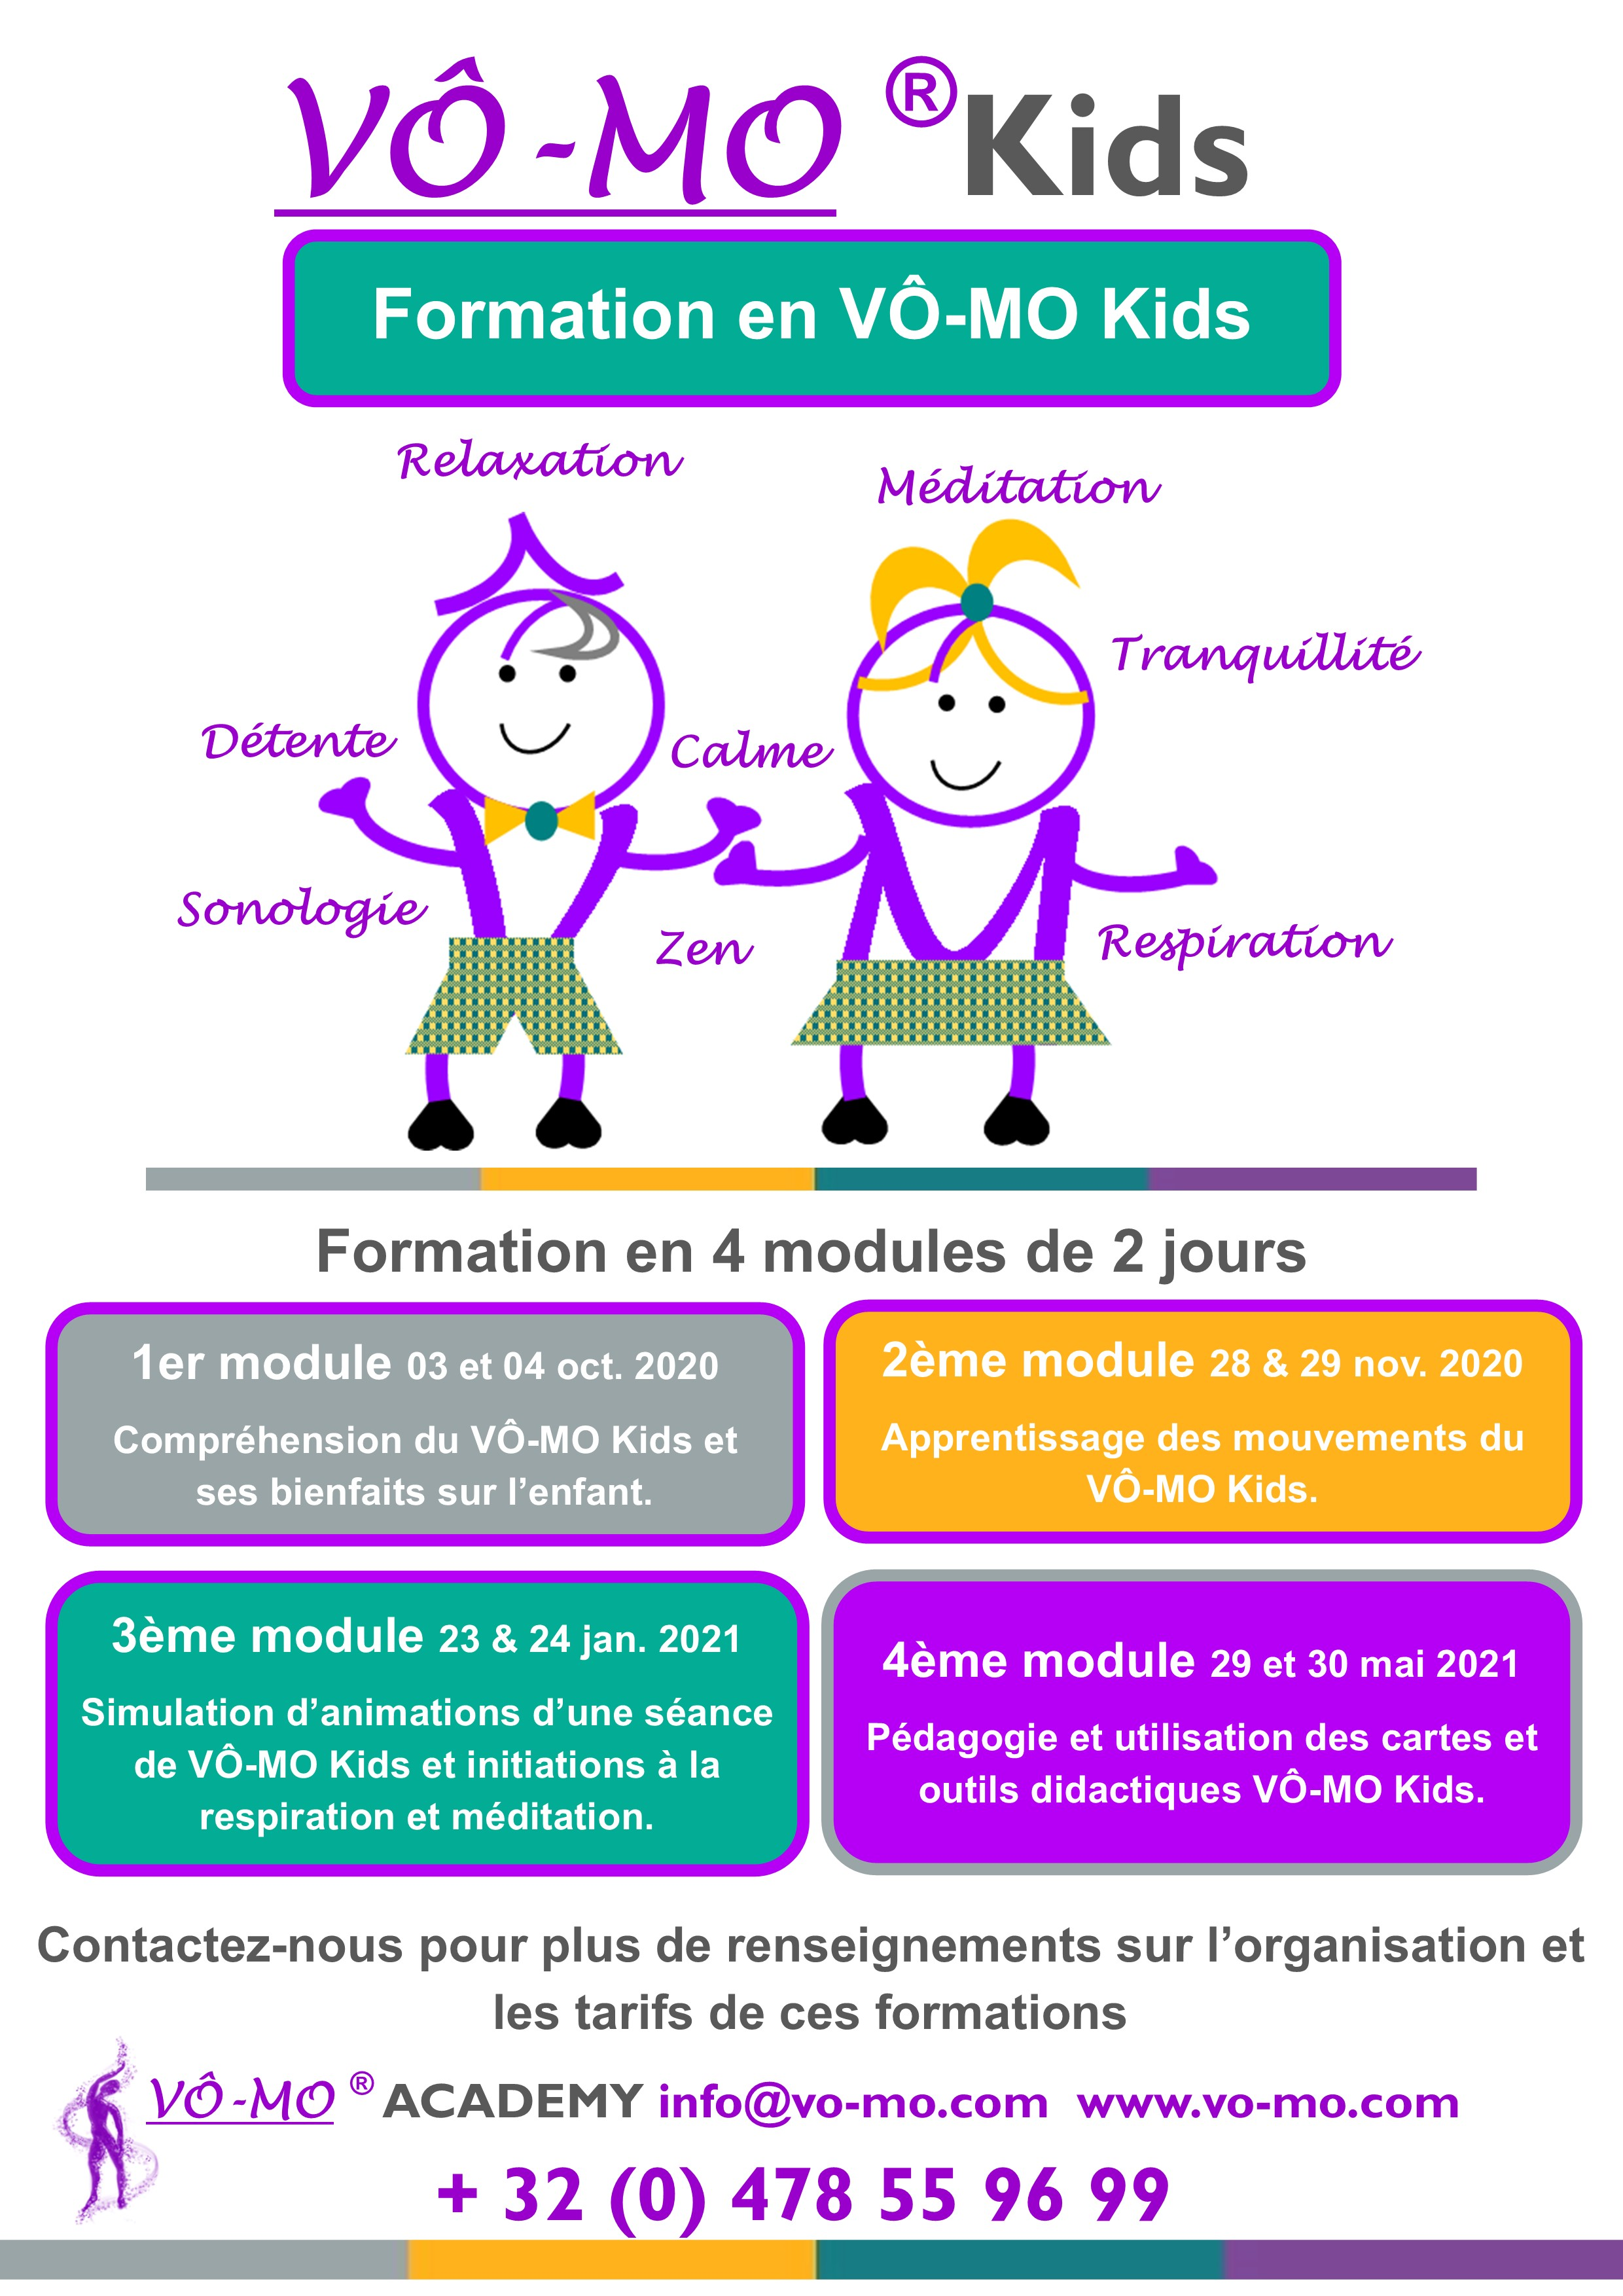 Formation en VÔ-MO Kids - module 1 @ VÔ-MO Academy